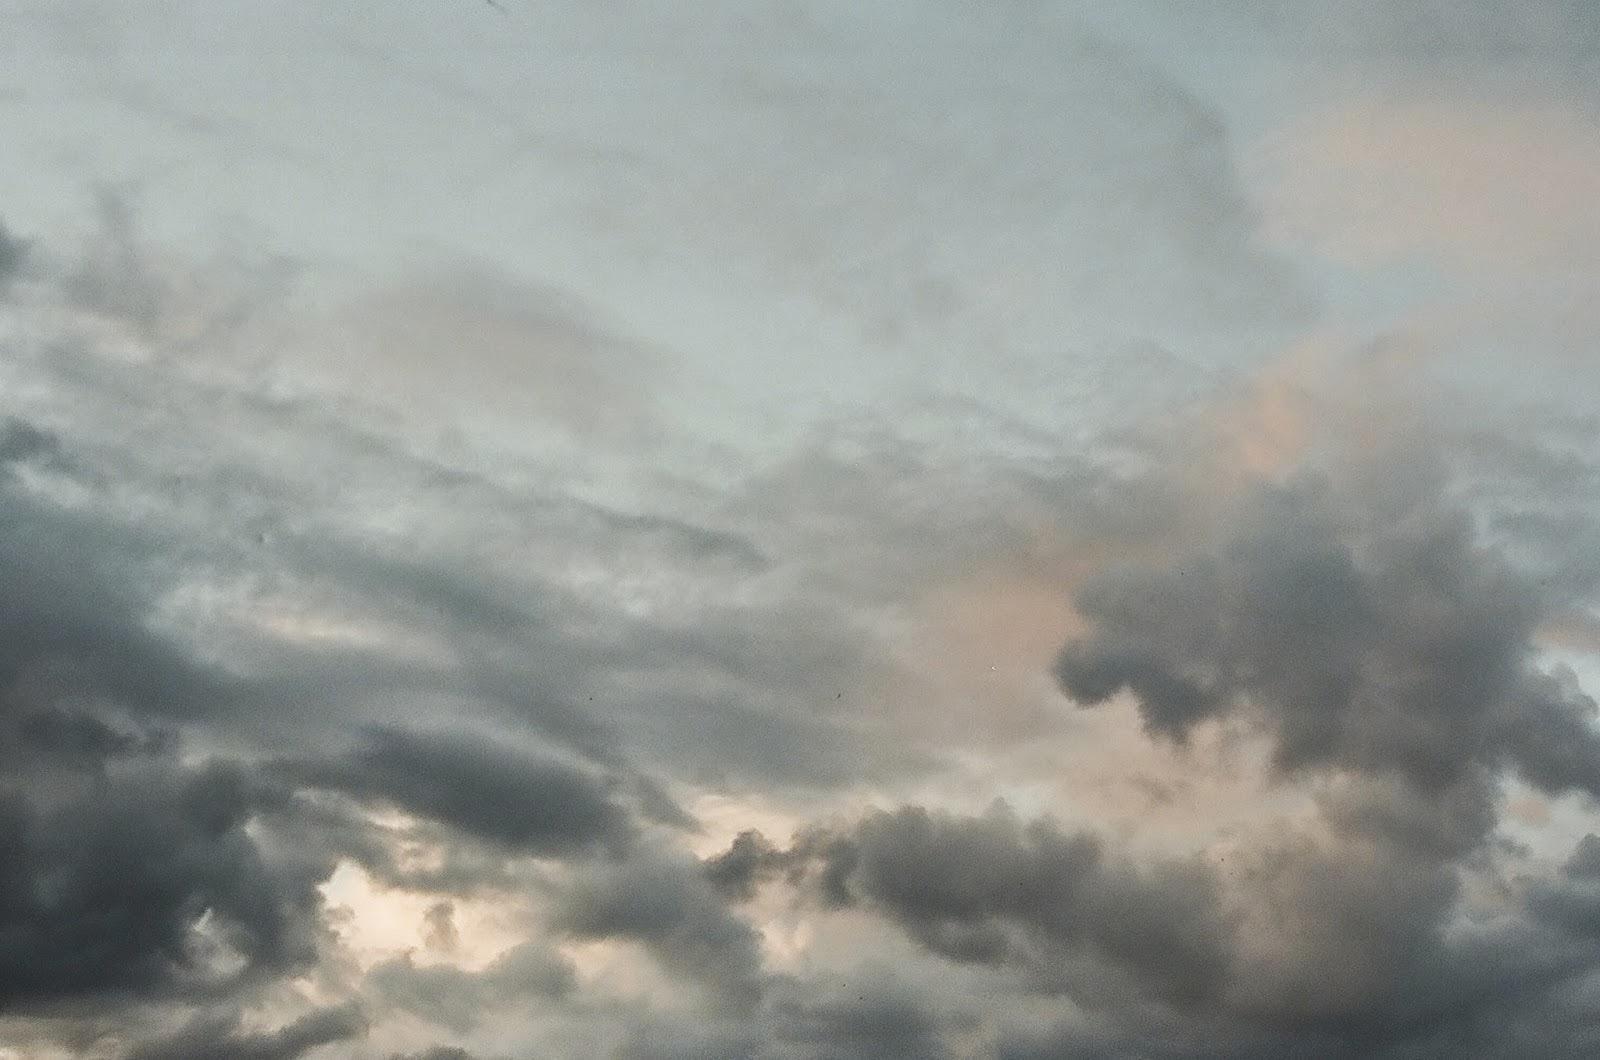 clouds_cloud_film_photographer_emily_walker_11.jpg